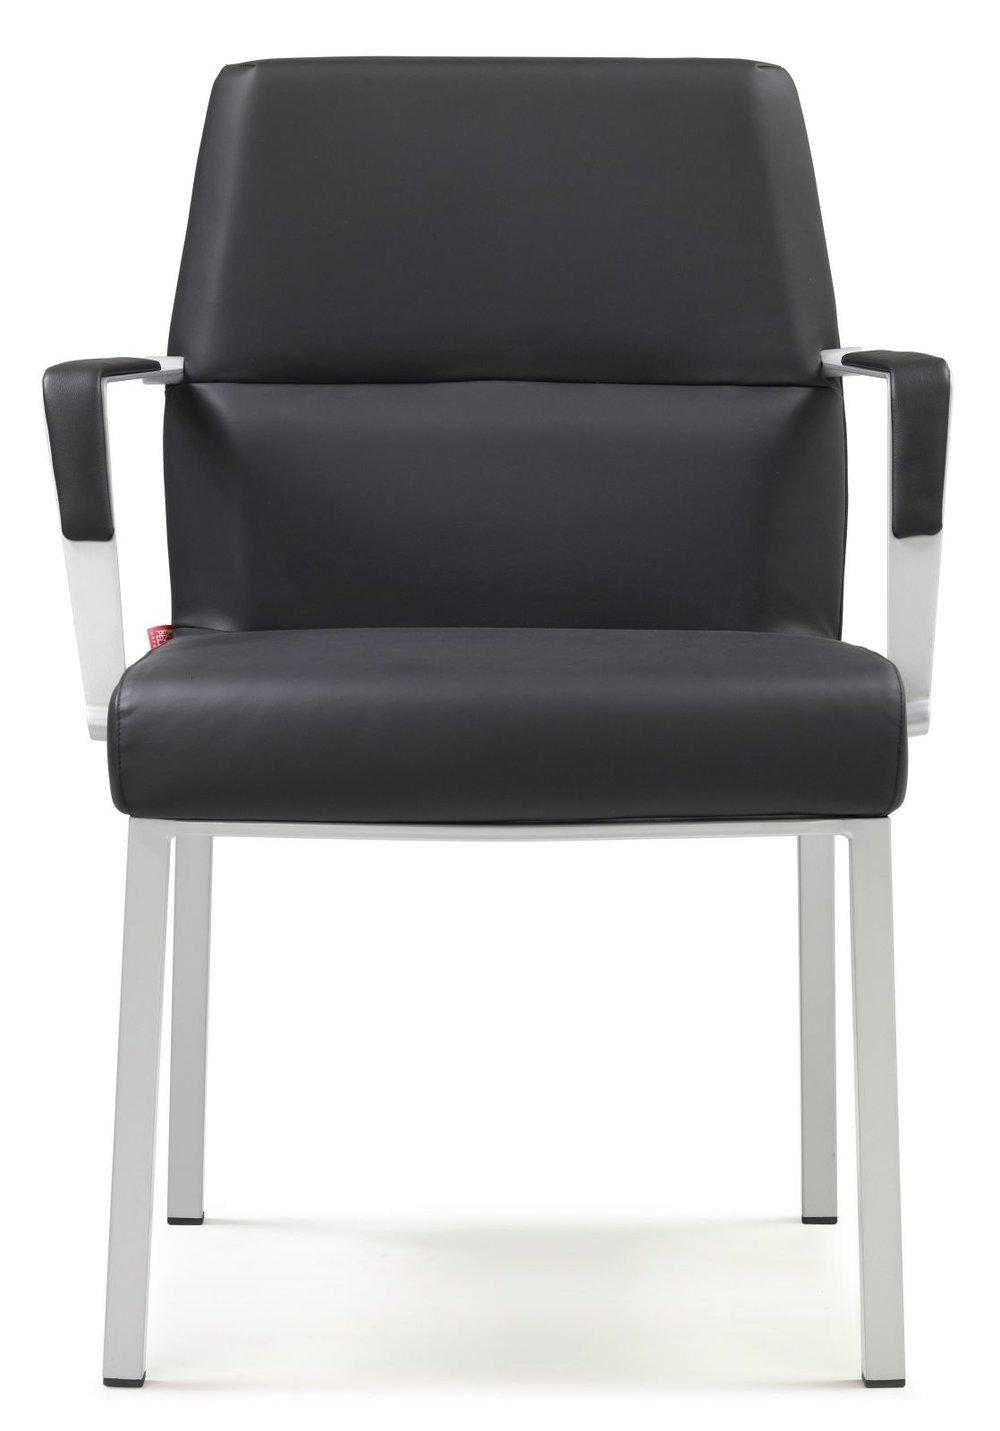 modern-office-armchairs-Italian-furniture-designer-armchairs (44).jpg